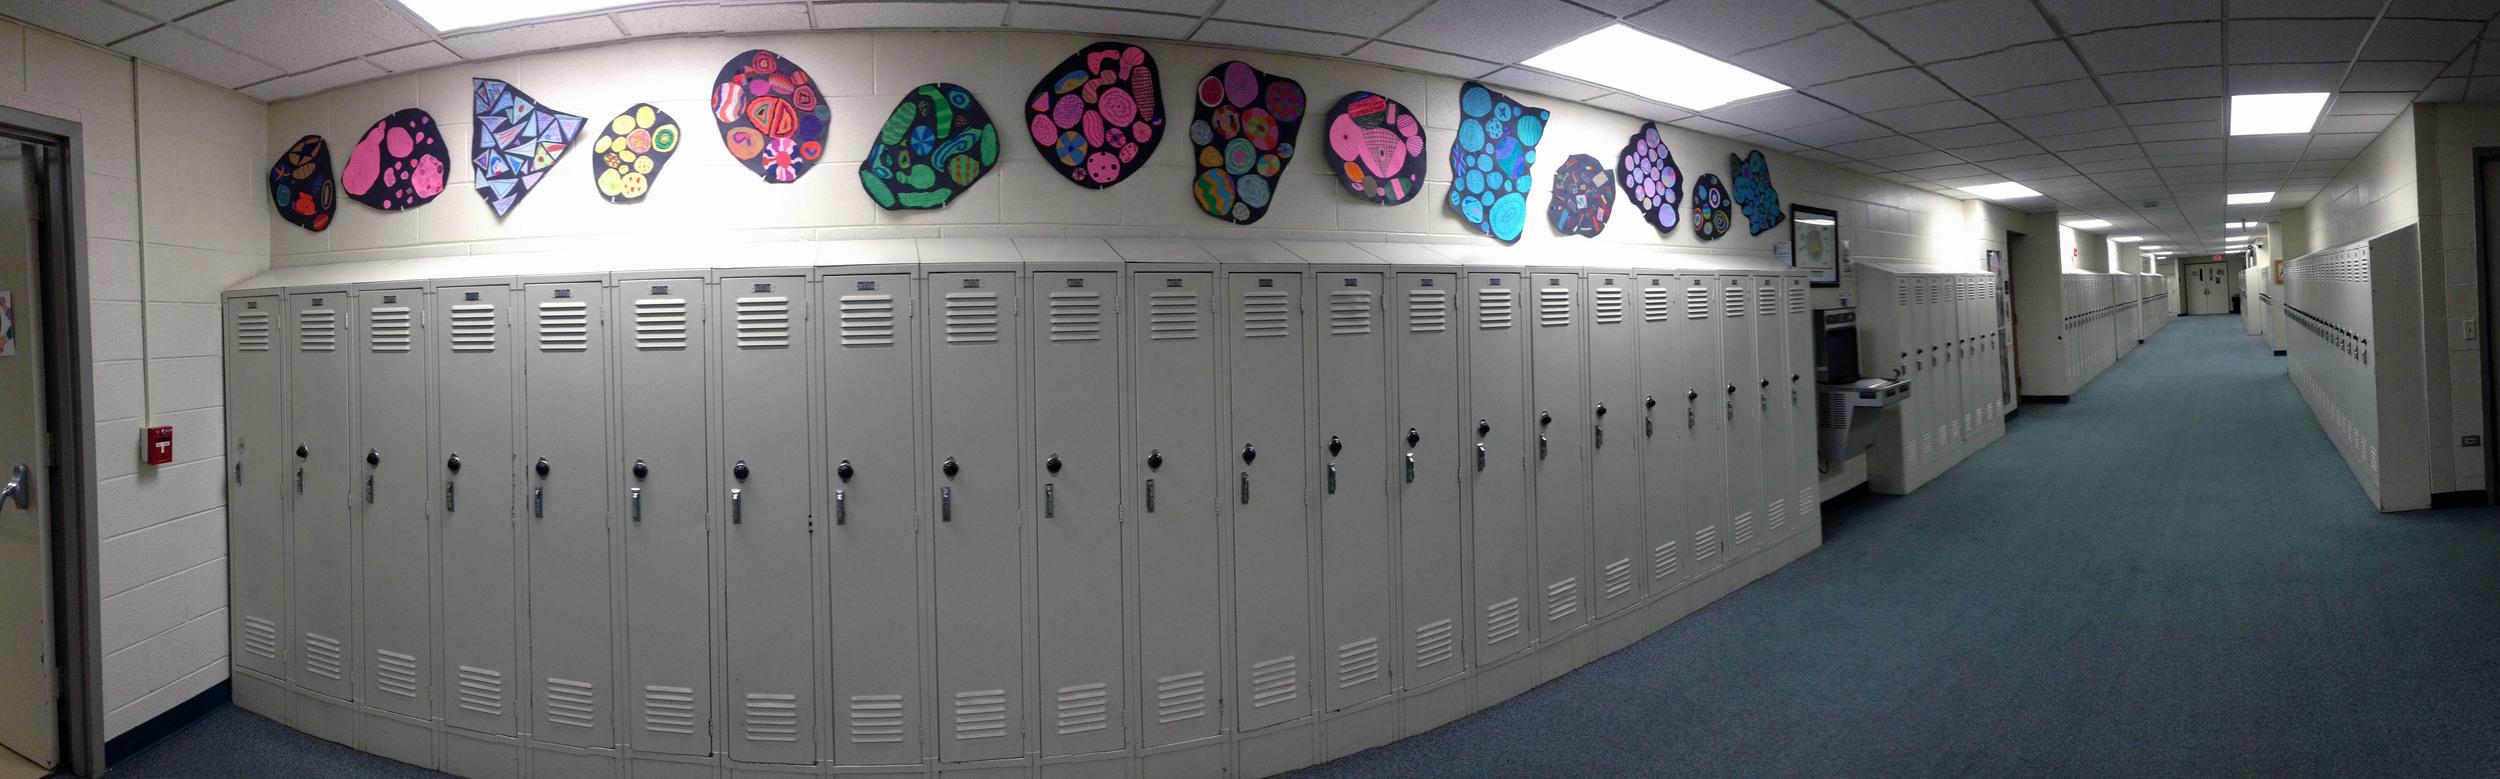 6th grade shape study installation